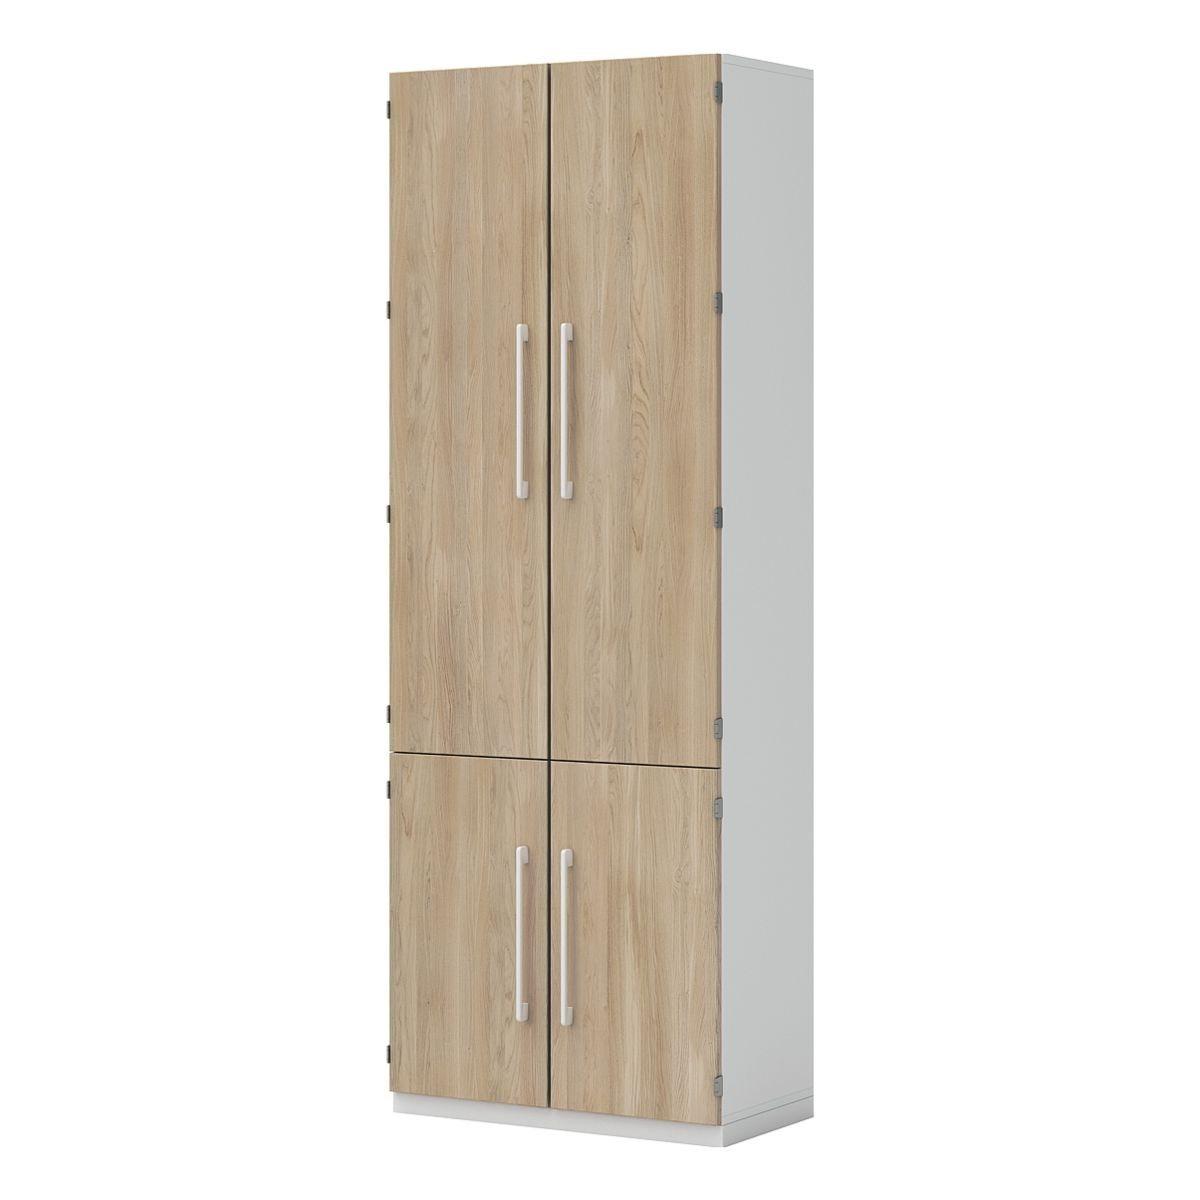 Aktenschrank 6 OH breit 4 Türen »Objekt Pur« | Büro > Büroschränke > Aktenschränke | Abs - Massivholz | KEINE MARKE